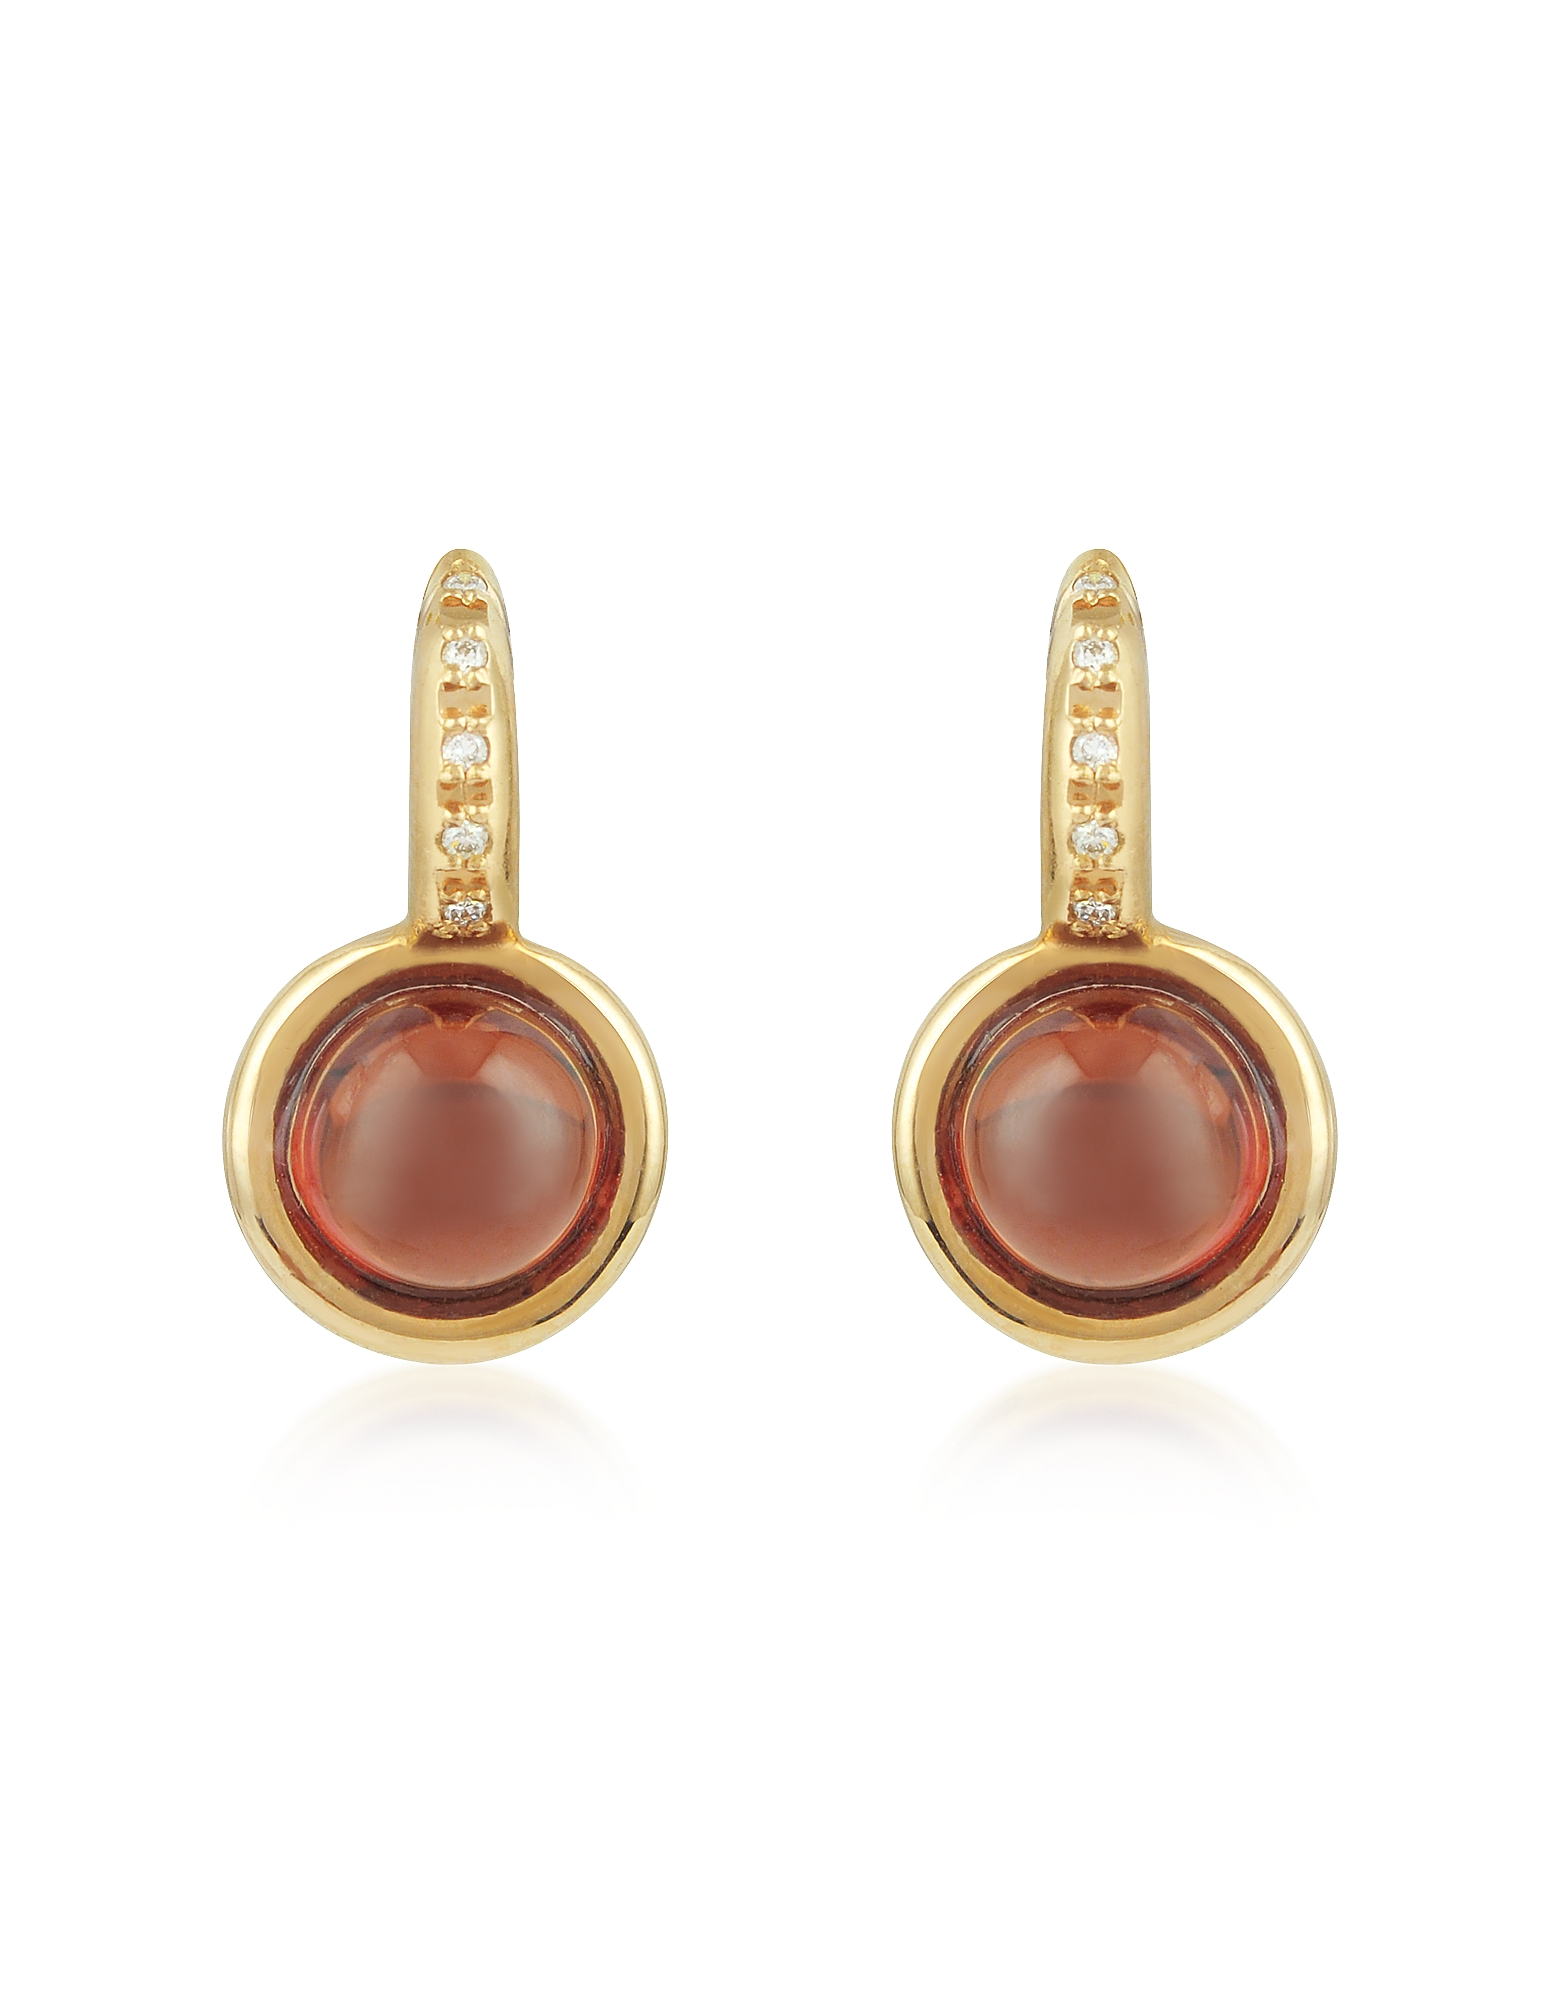 Mia & Beverly Earrings, Garnet and Diamond 18K Rose Gold Earrings